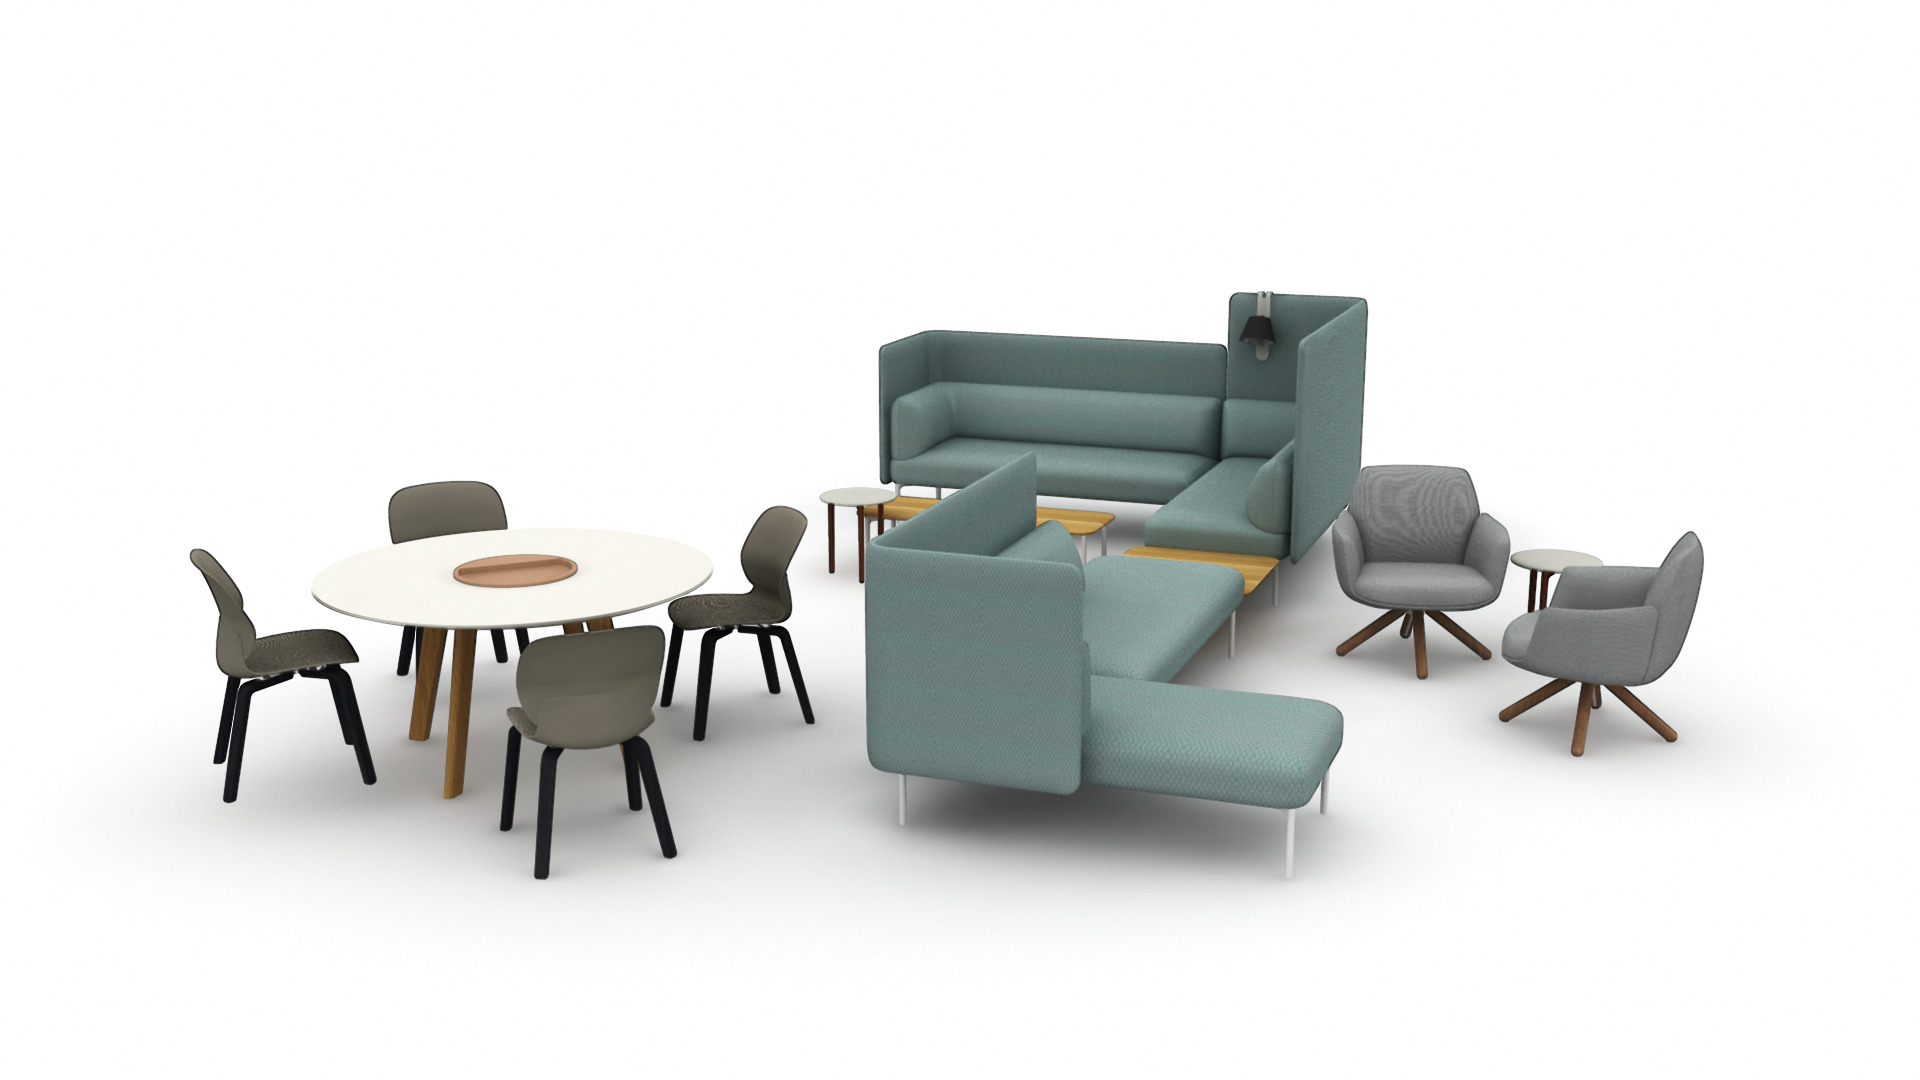 Seating: Haworth Poppy Lounge